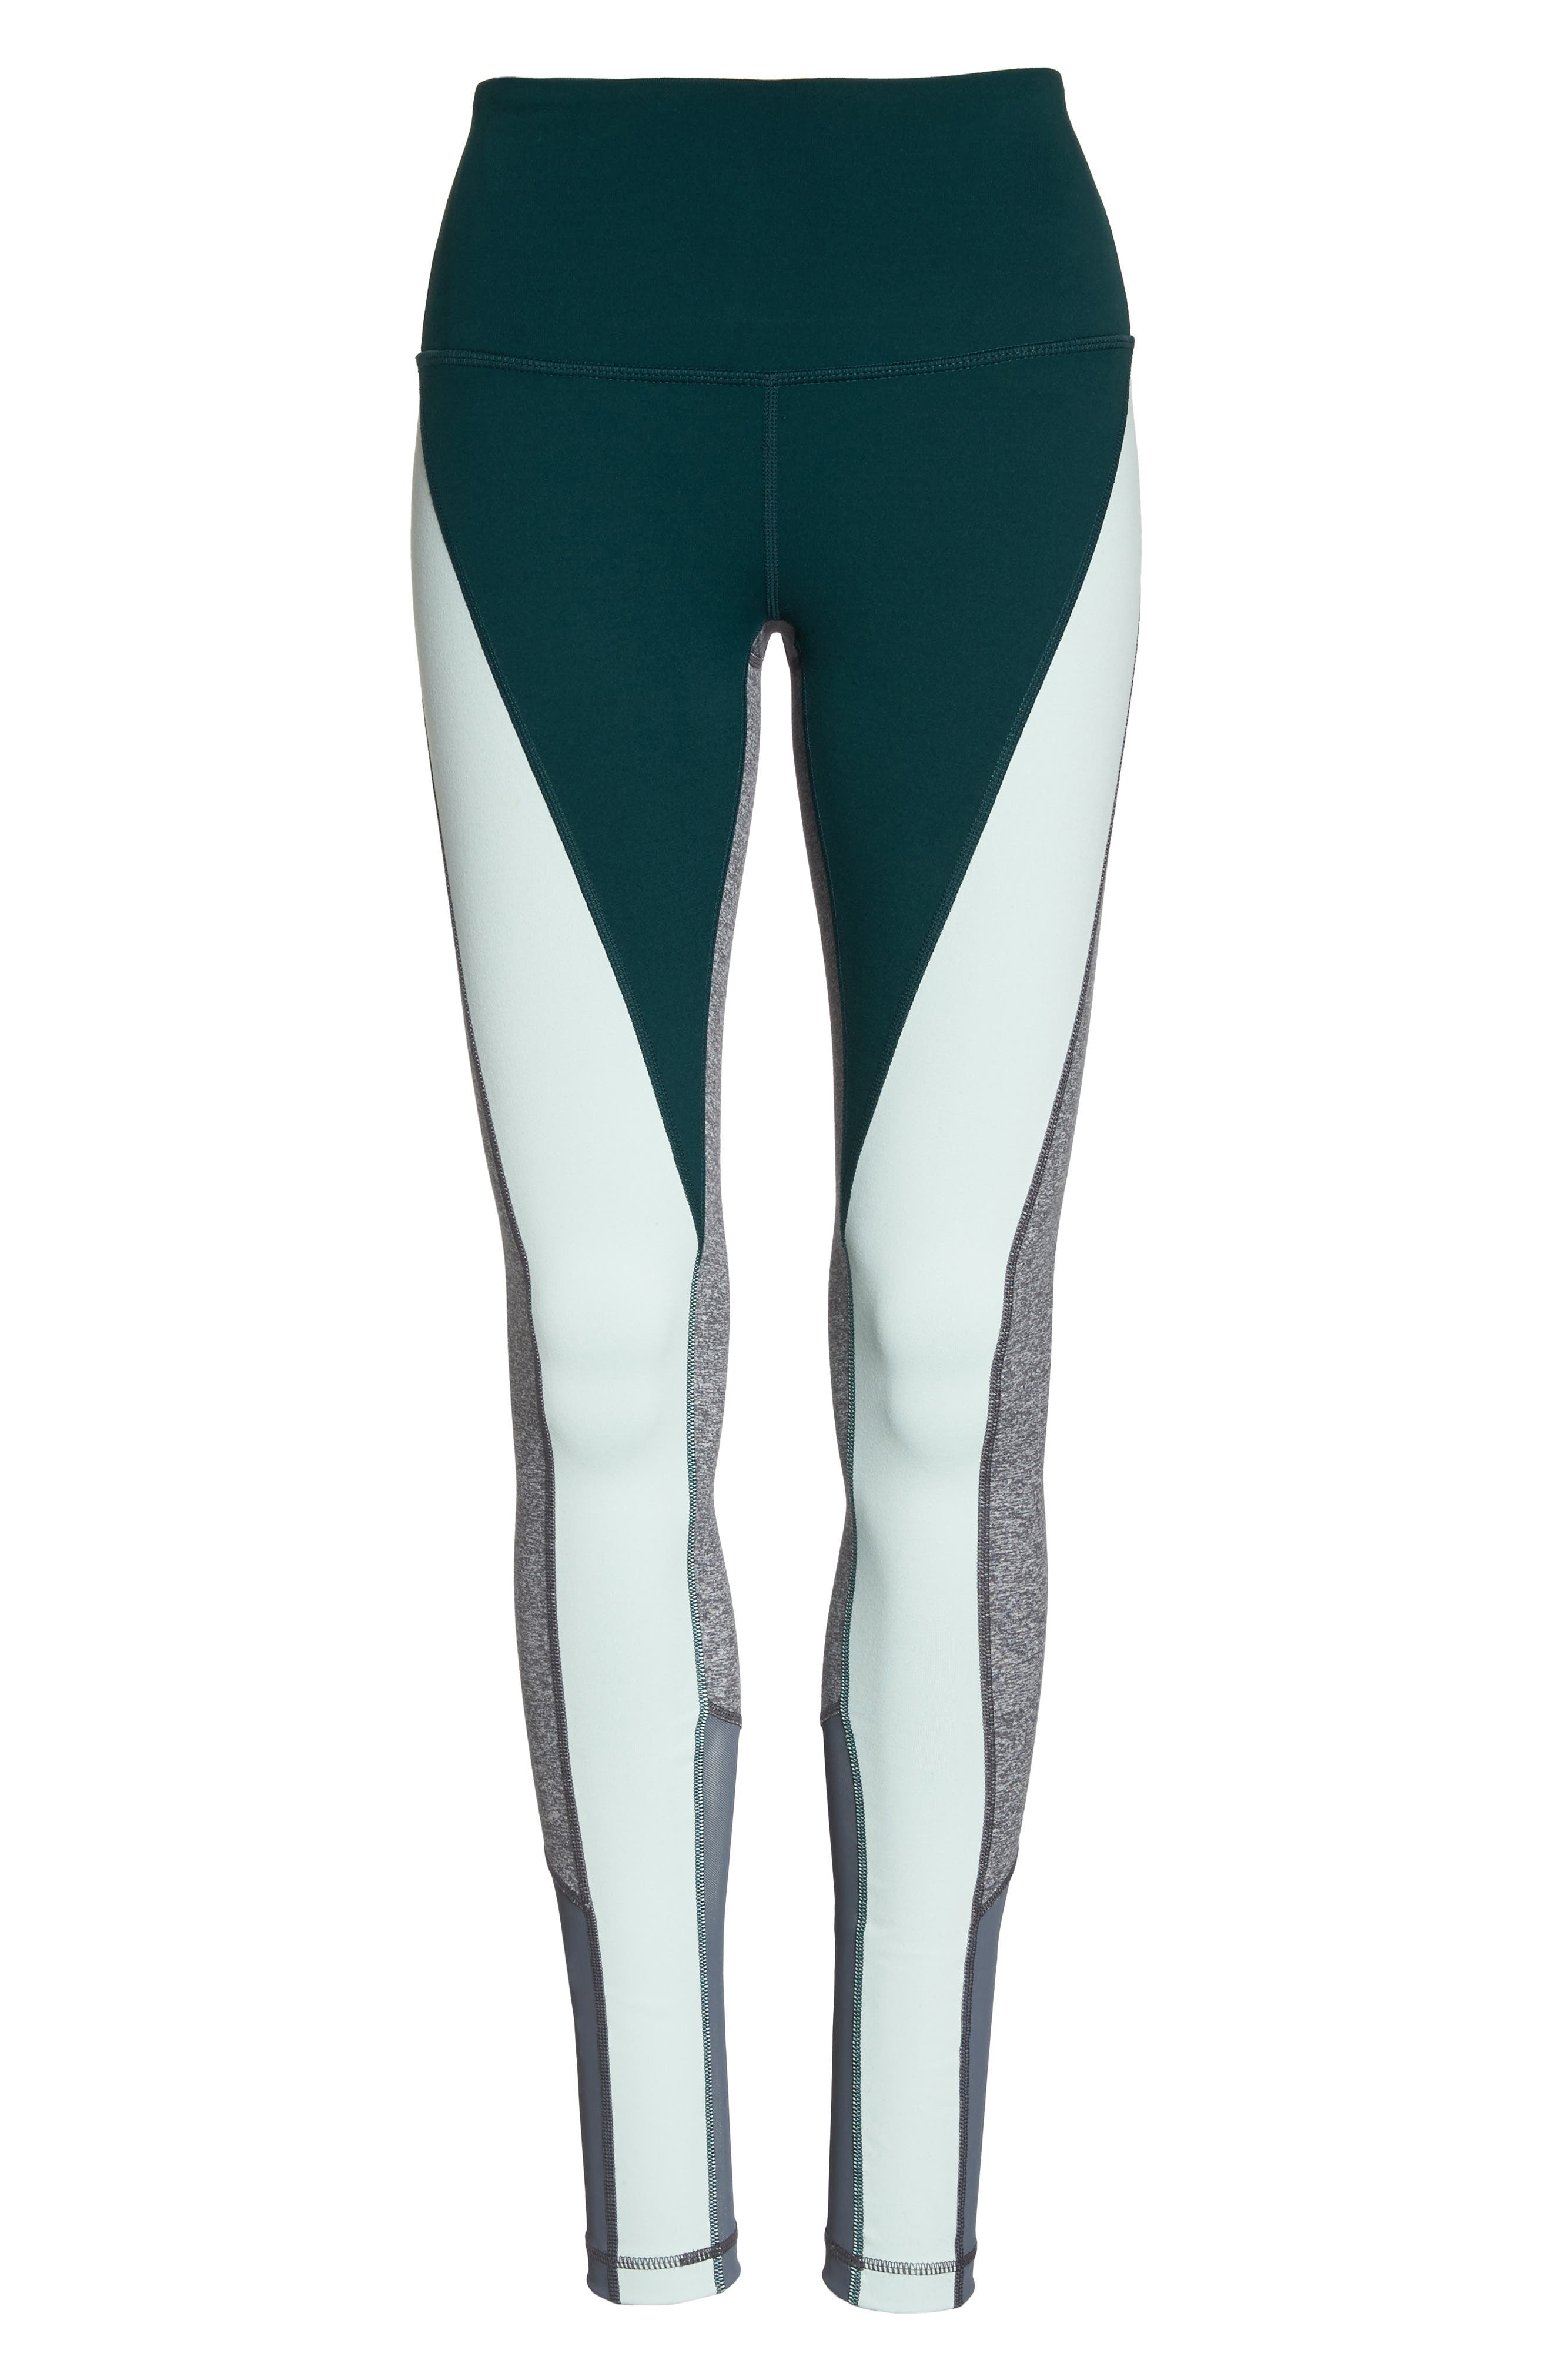 Get in Line High Waist Leggings,                             Alternate thumbnail 7, color,                             Green Ponderosa